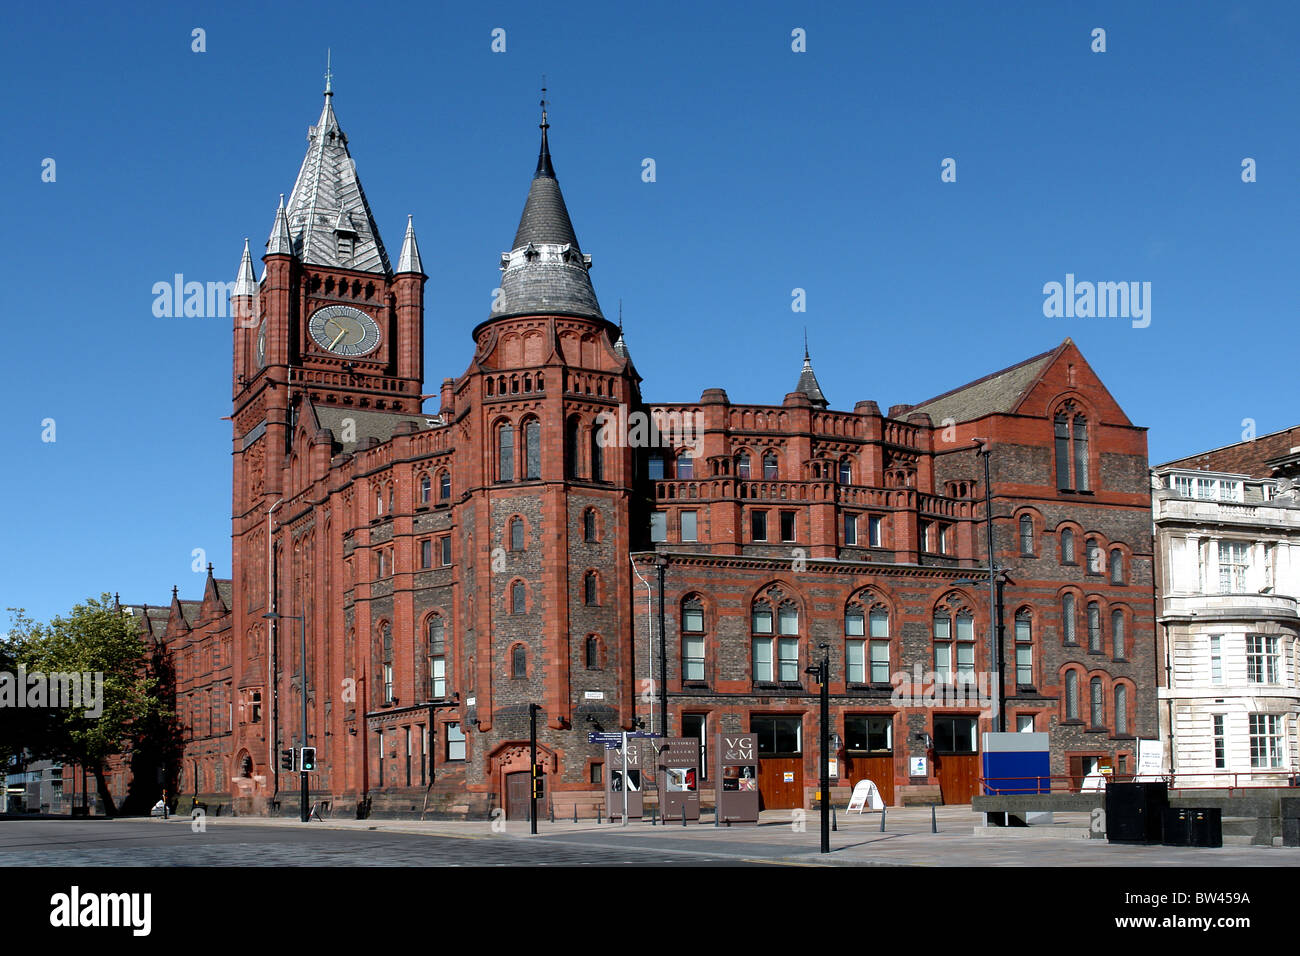 Victoria Gallery and Museum, Ashton St, University of Liverpool, Merseyside, England, United Kingdom - Stock Image